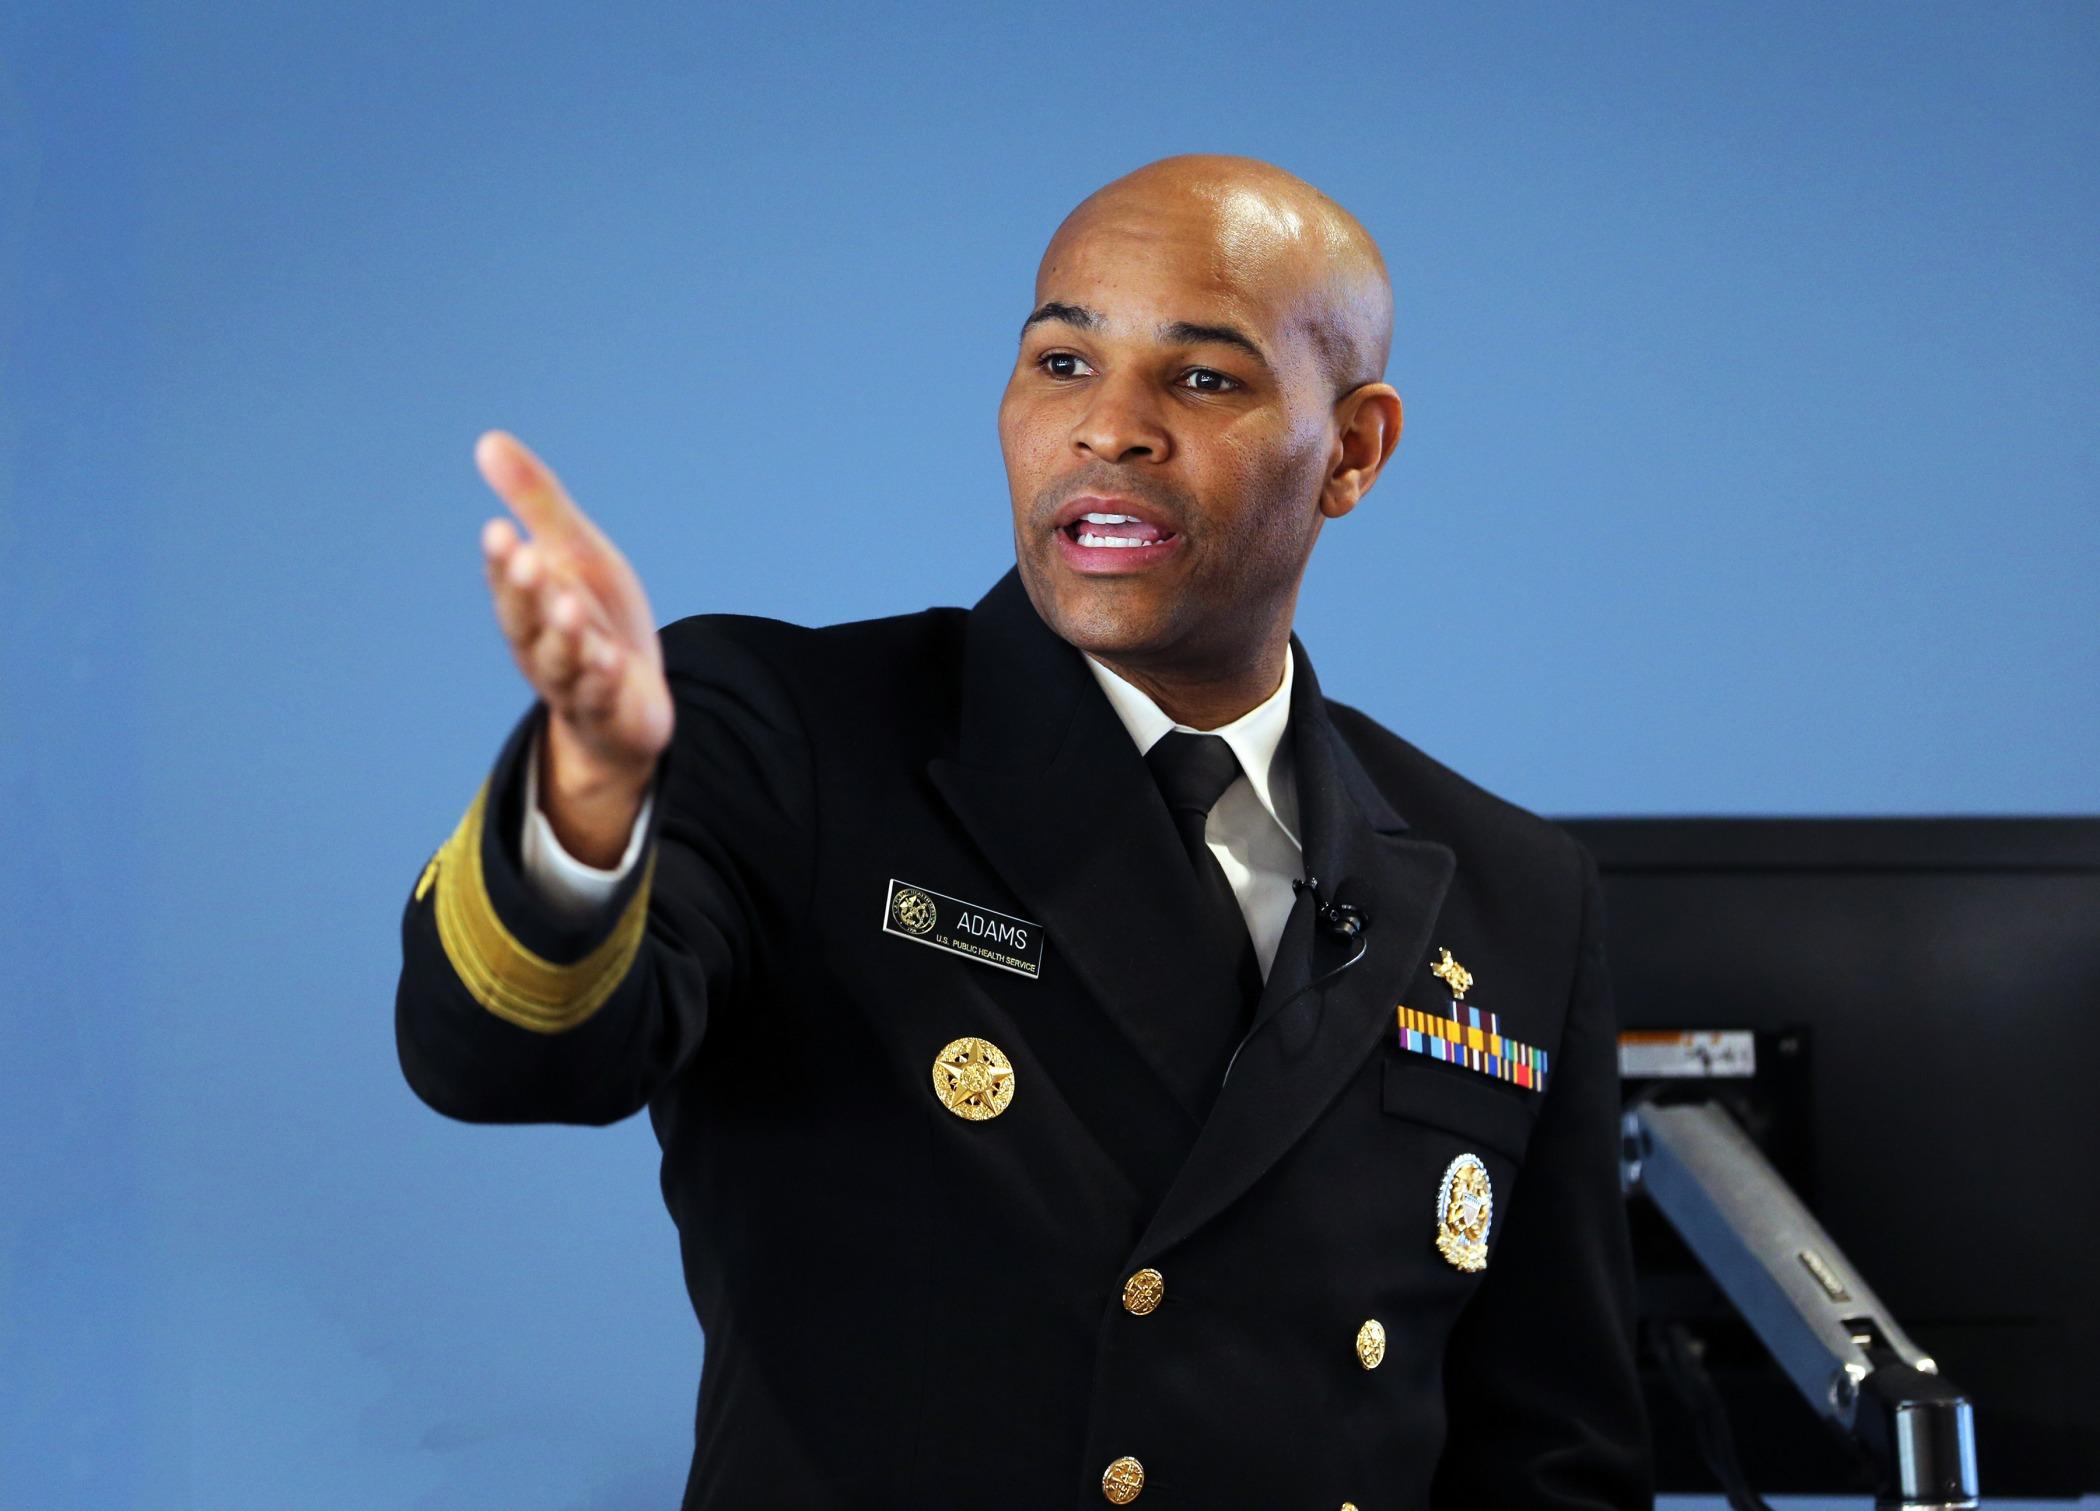 U.S. Surgeon General Jerome Adams